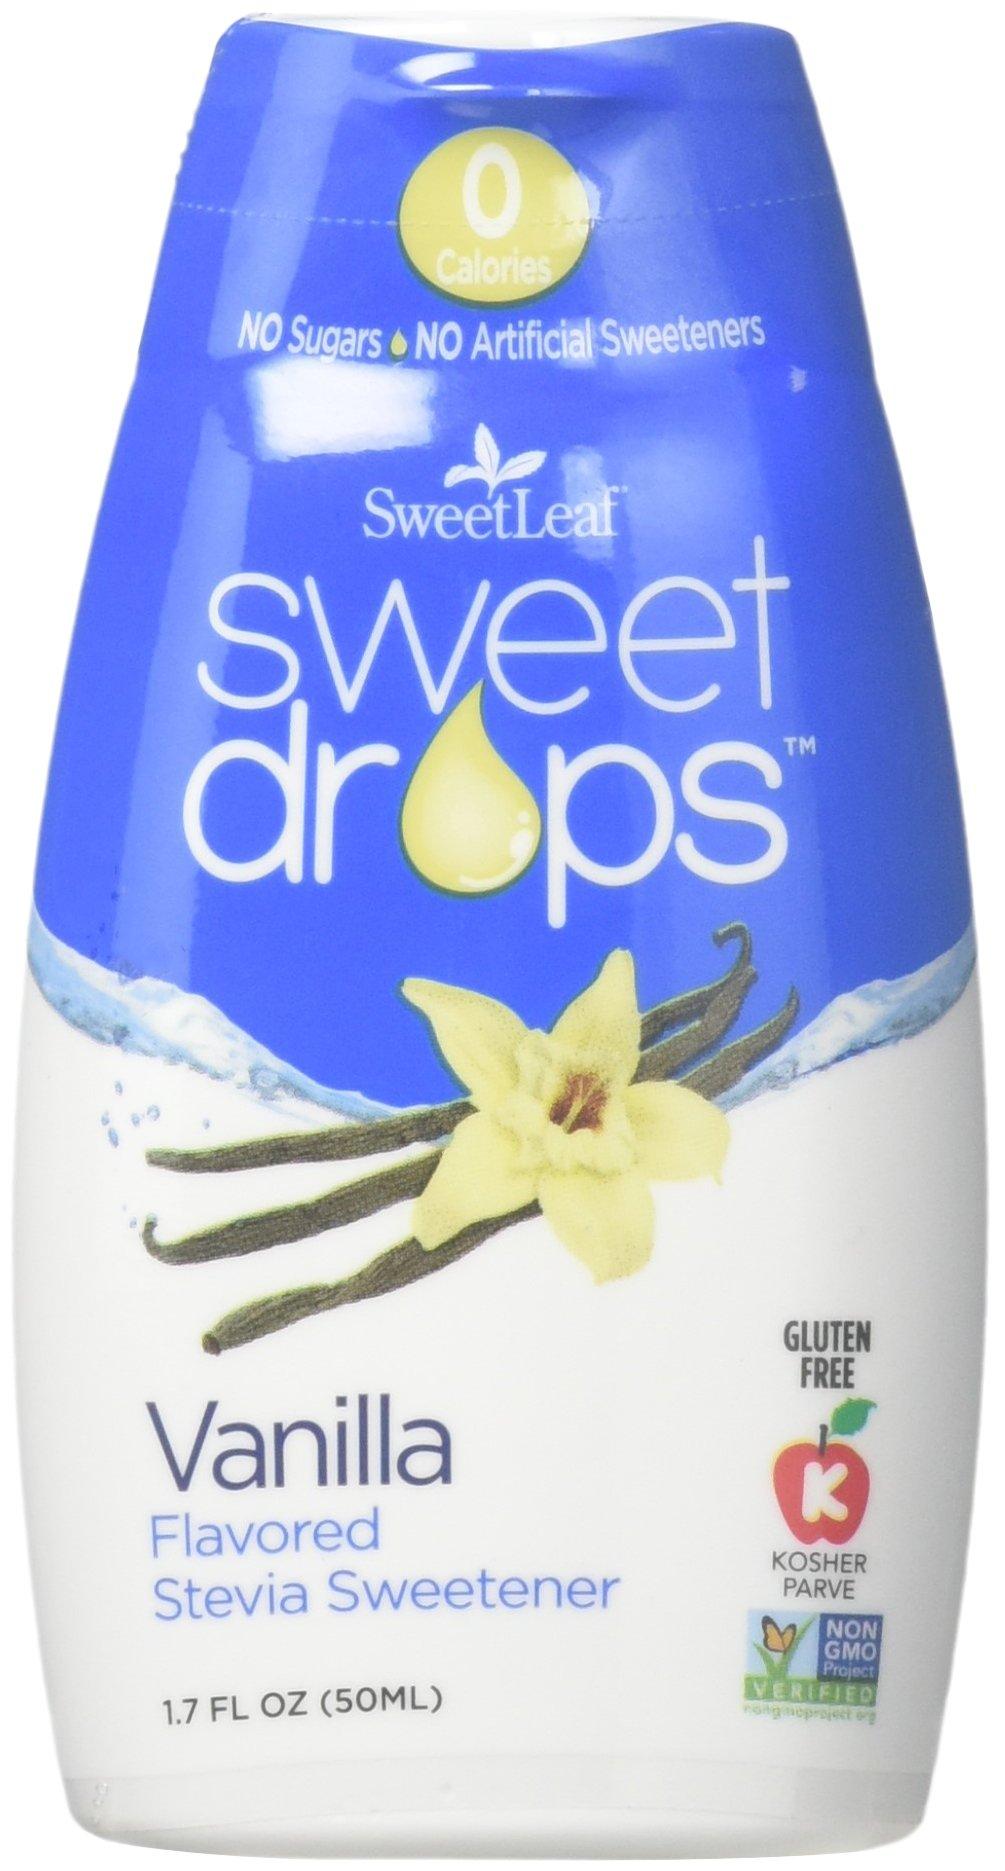 Wisdom Sweet Drops Vanilla 1.7 fl.oz 6 Pack by SweetLeaf